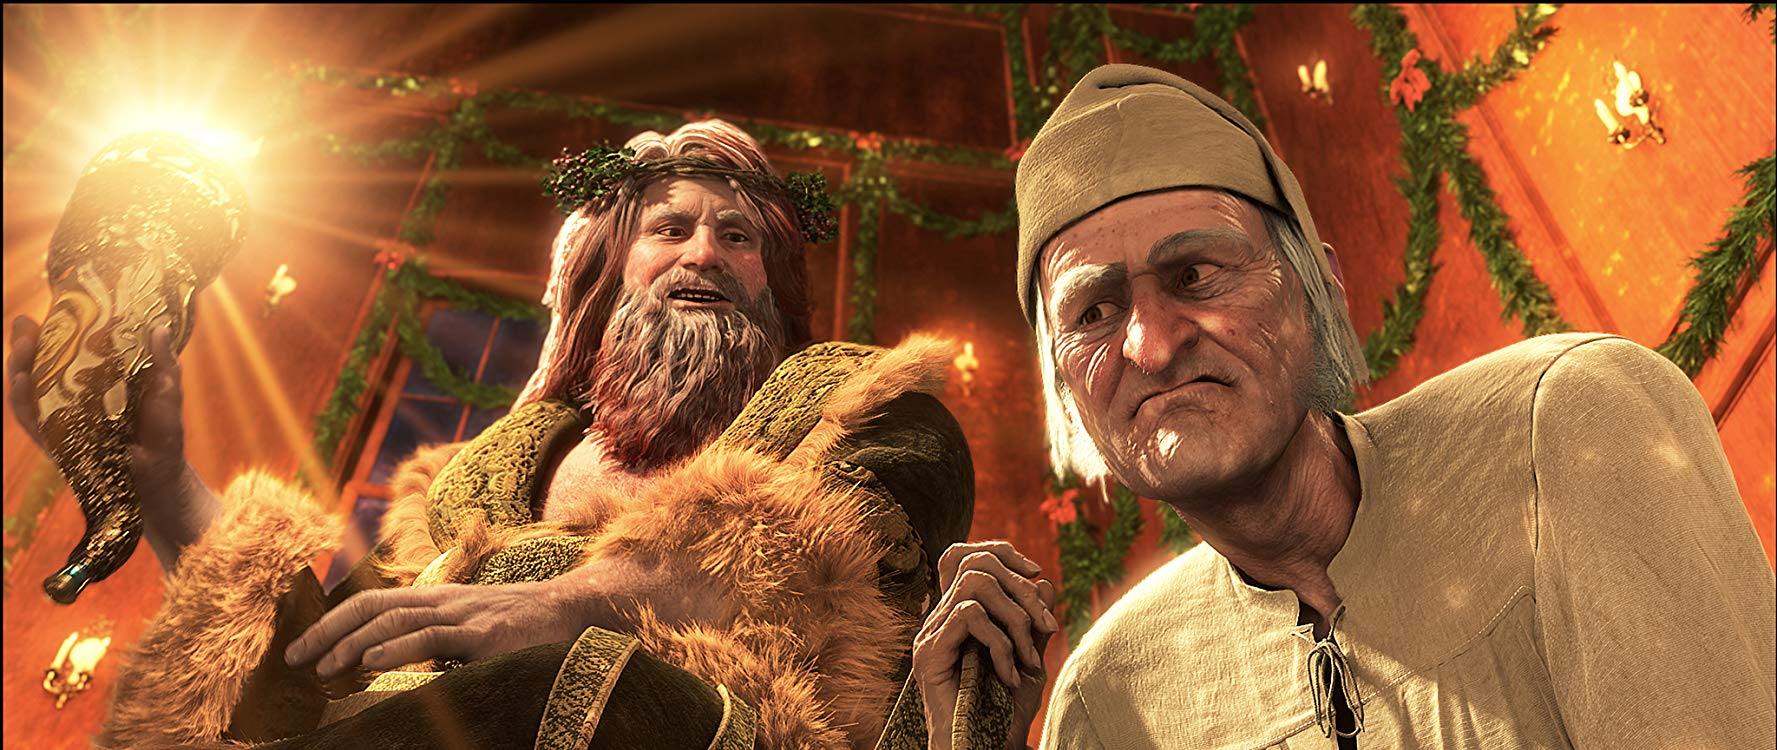 12 movies to watch on christmas 9.jpg